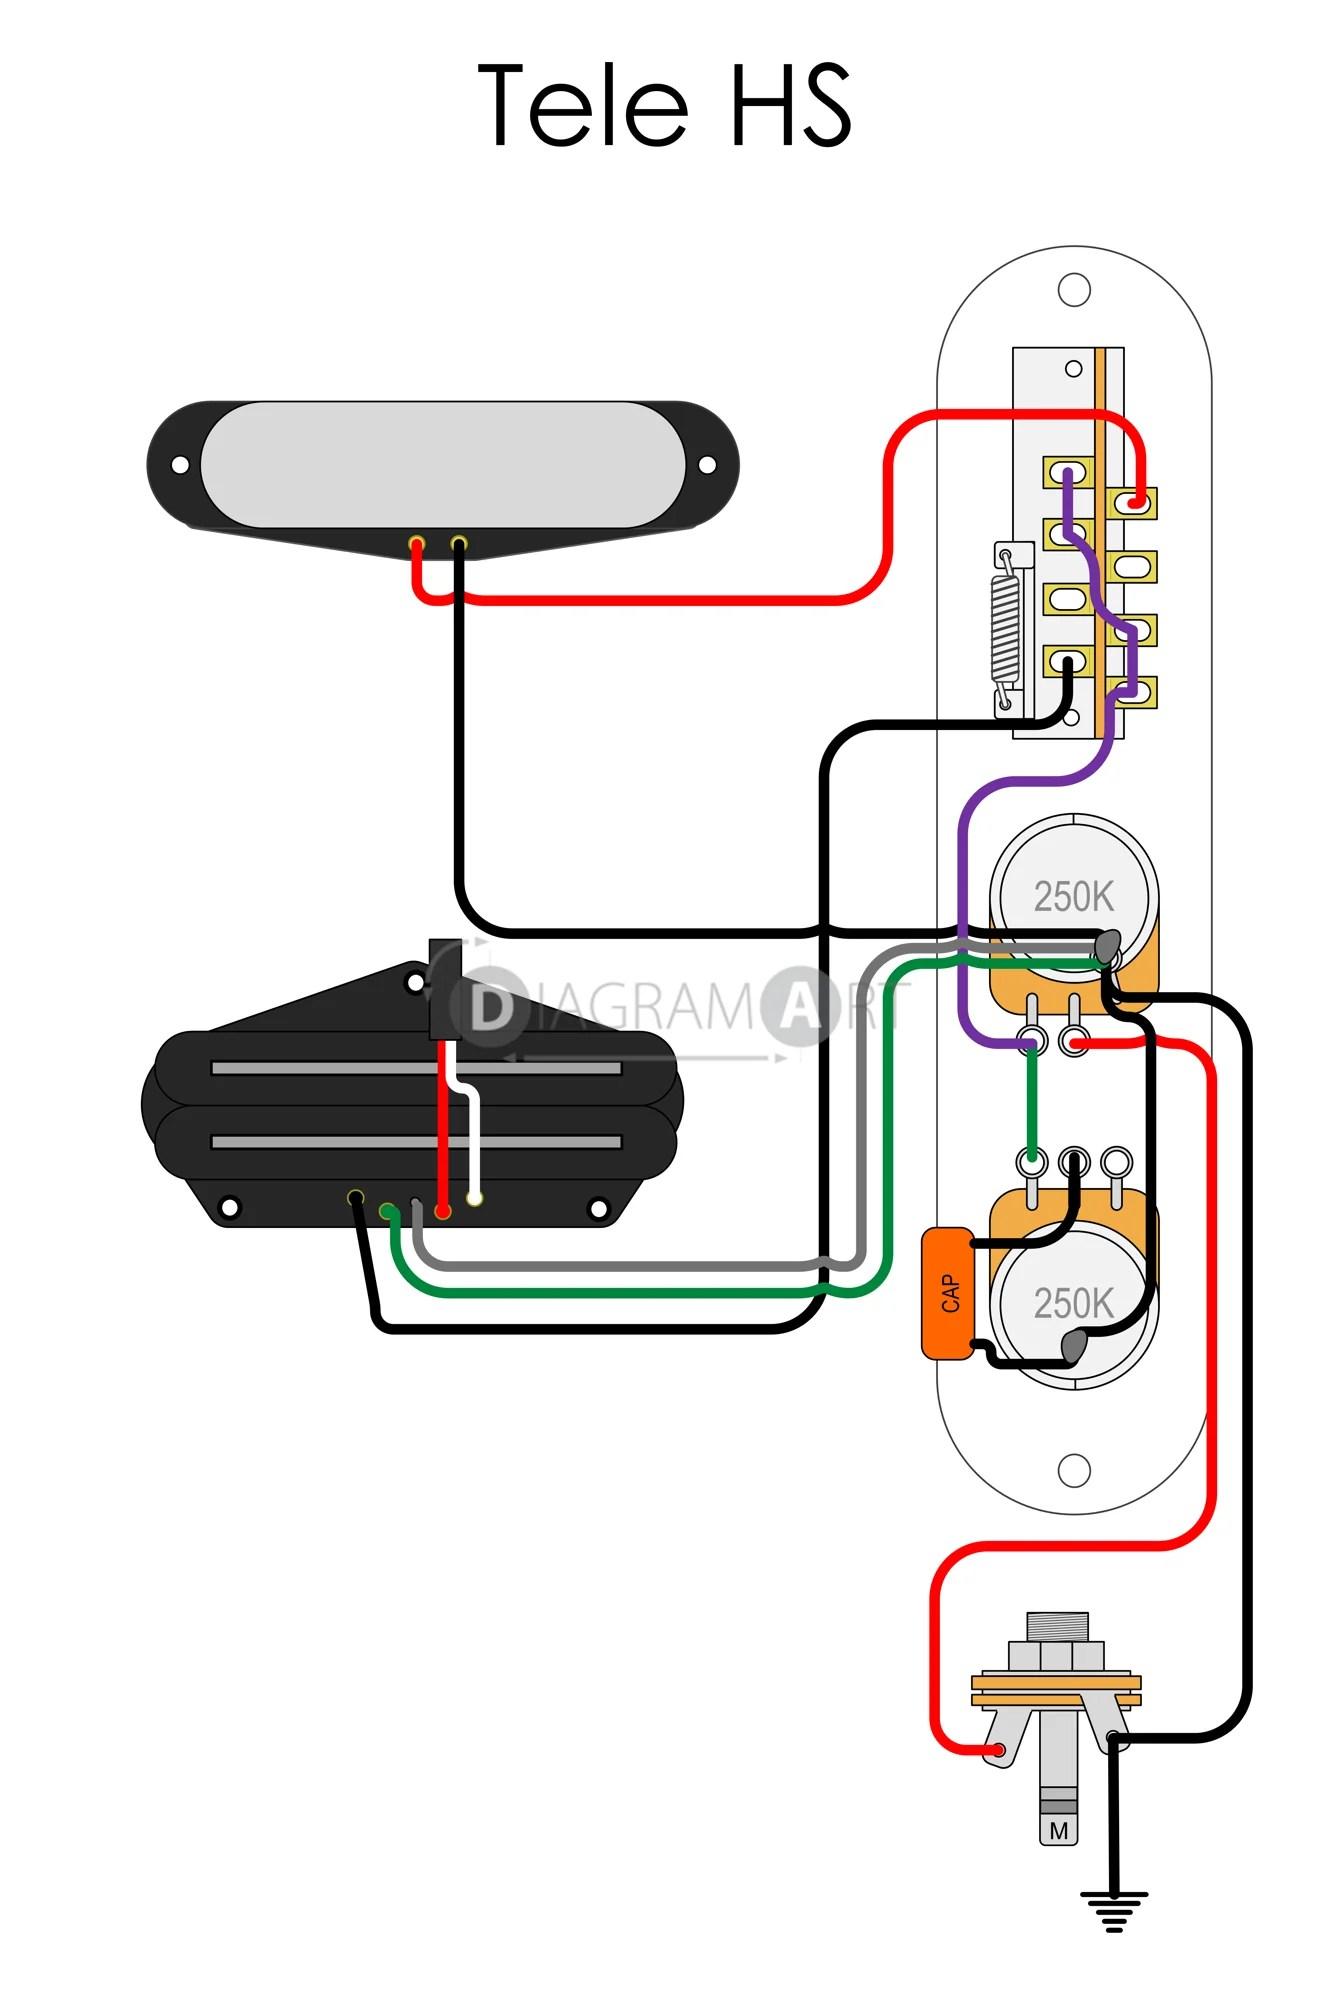 electric guitar wiring tele hs electric circuit diagramart telecaster seymour duncan wiring diagrams hs tele wiring diagram [ 1334 x 2000 Pixel ]